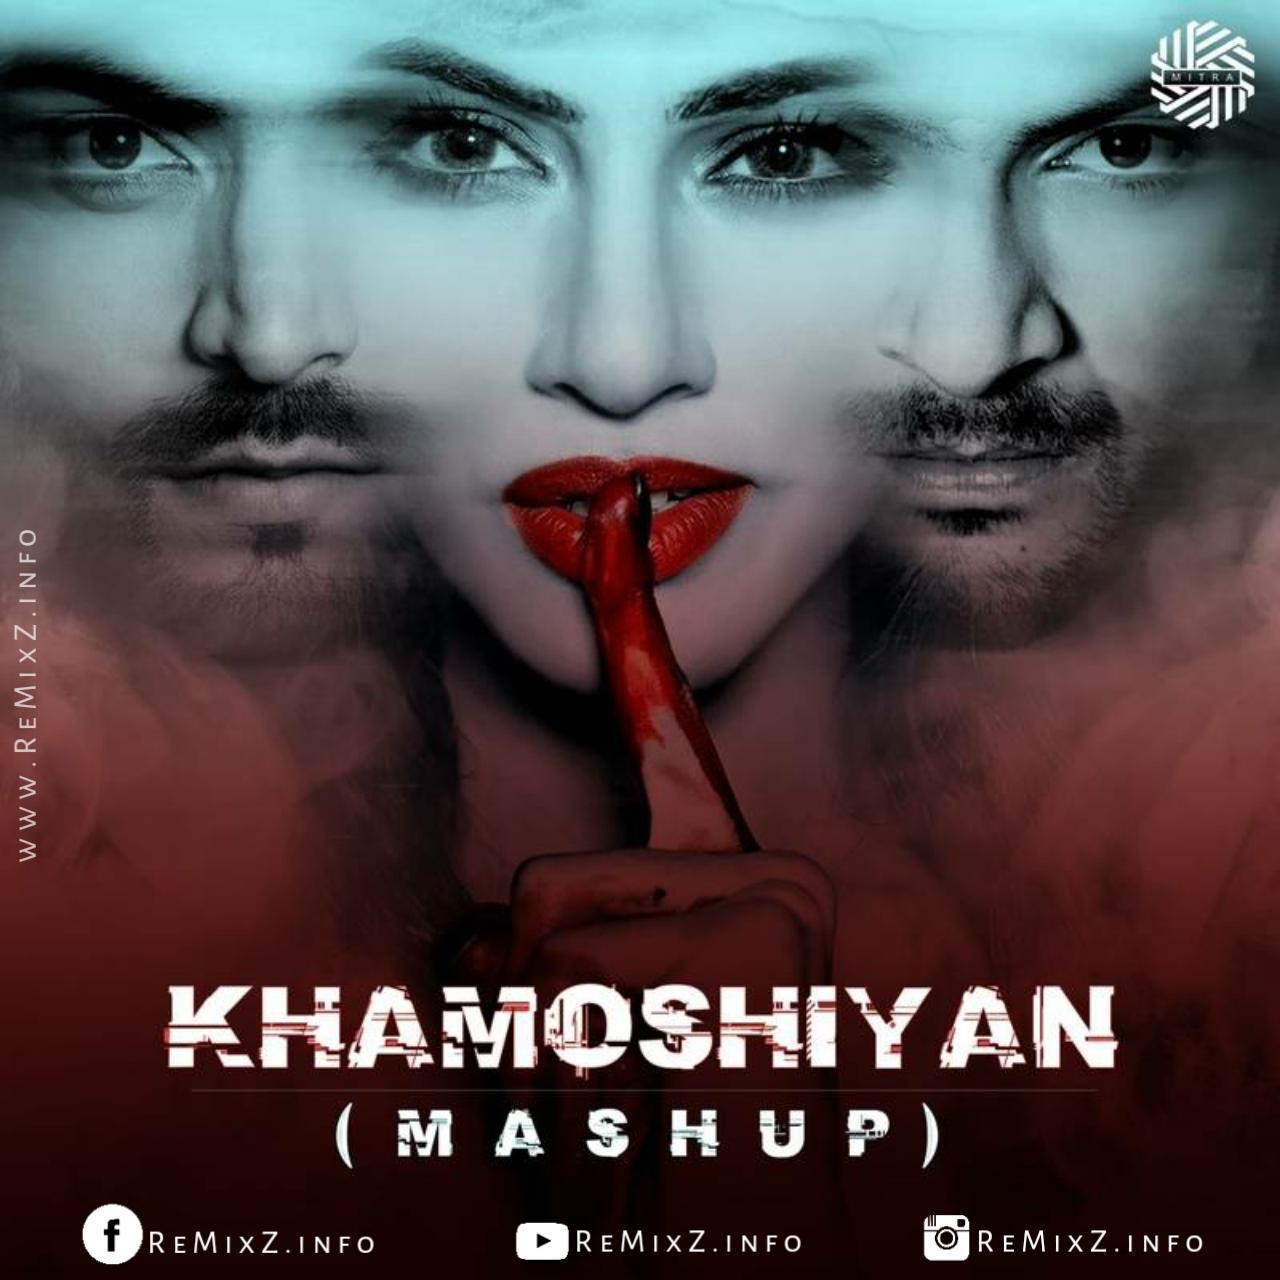 khamoshiyan-arijit-singh-mashup-dj-mitra.jpg